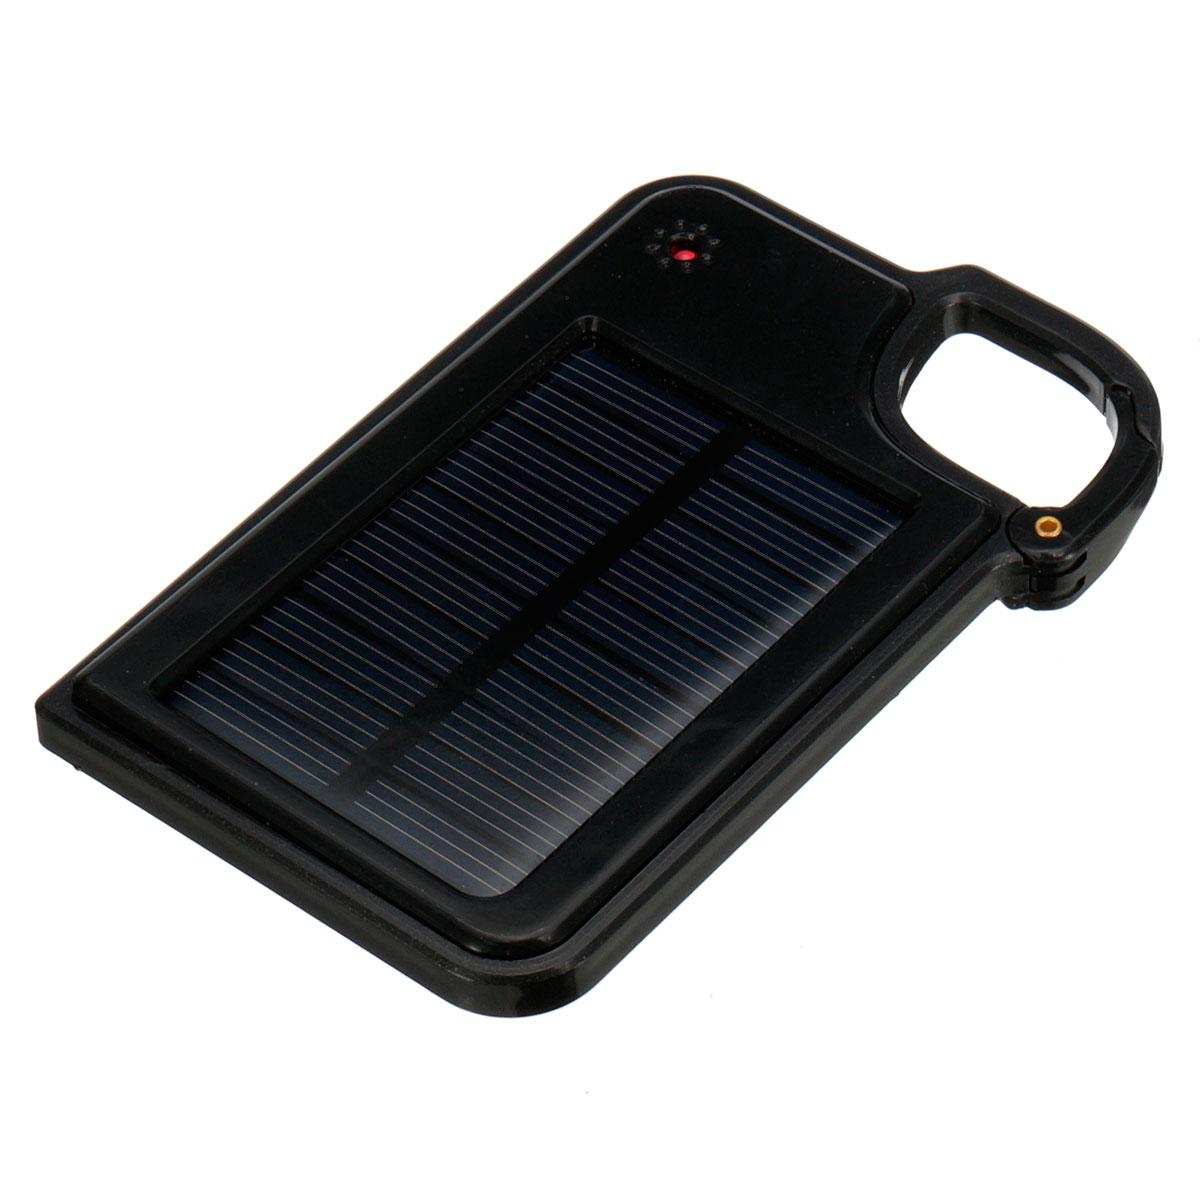 Extern solar panel ladeger t power bank usb batterie akku tab f r iphone samsung ebay - Extern panel ...